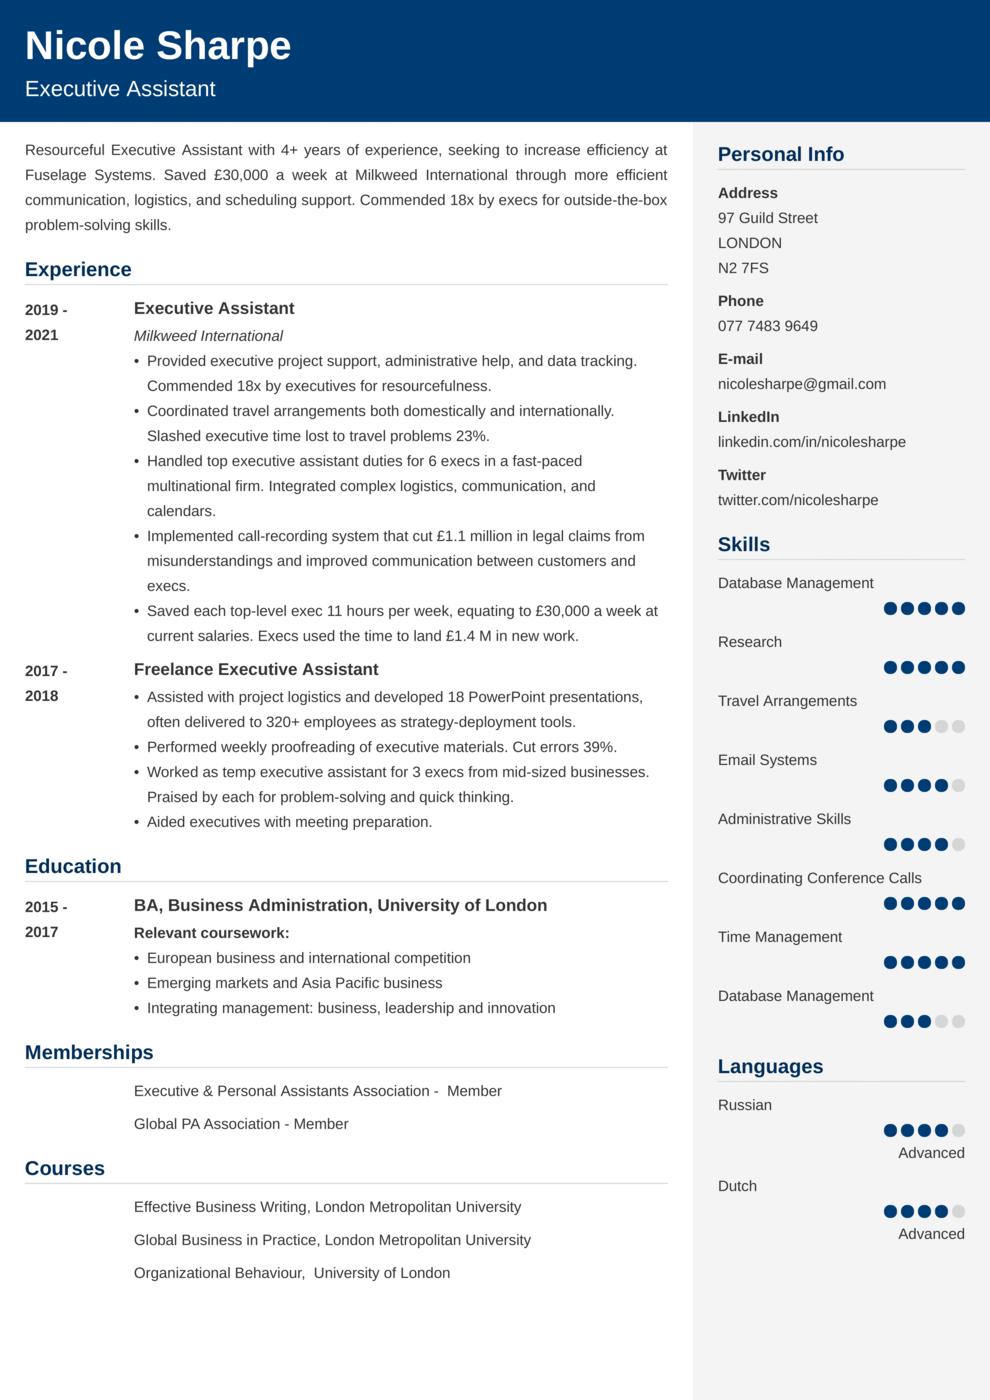 Executive Assistant CV Example